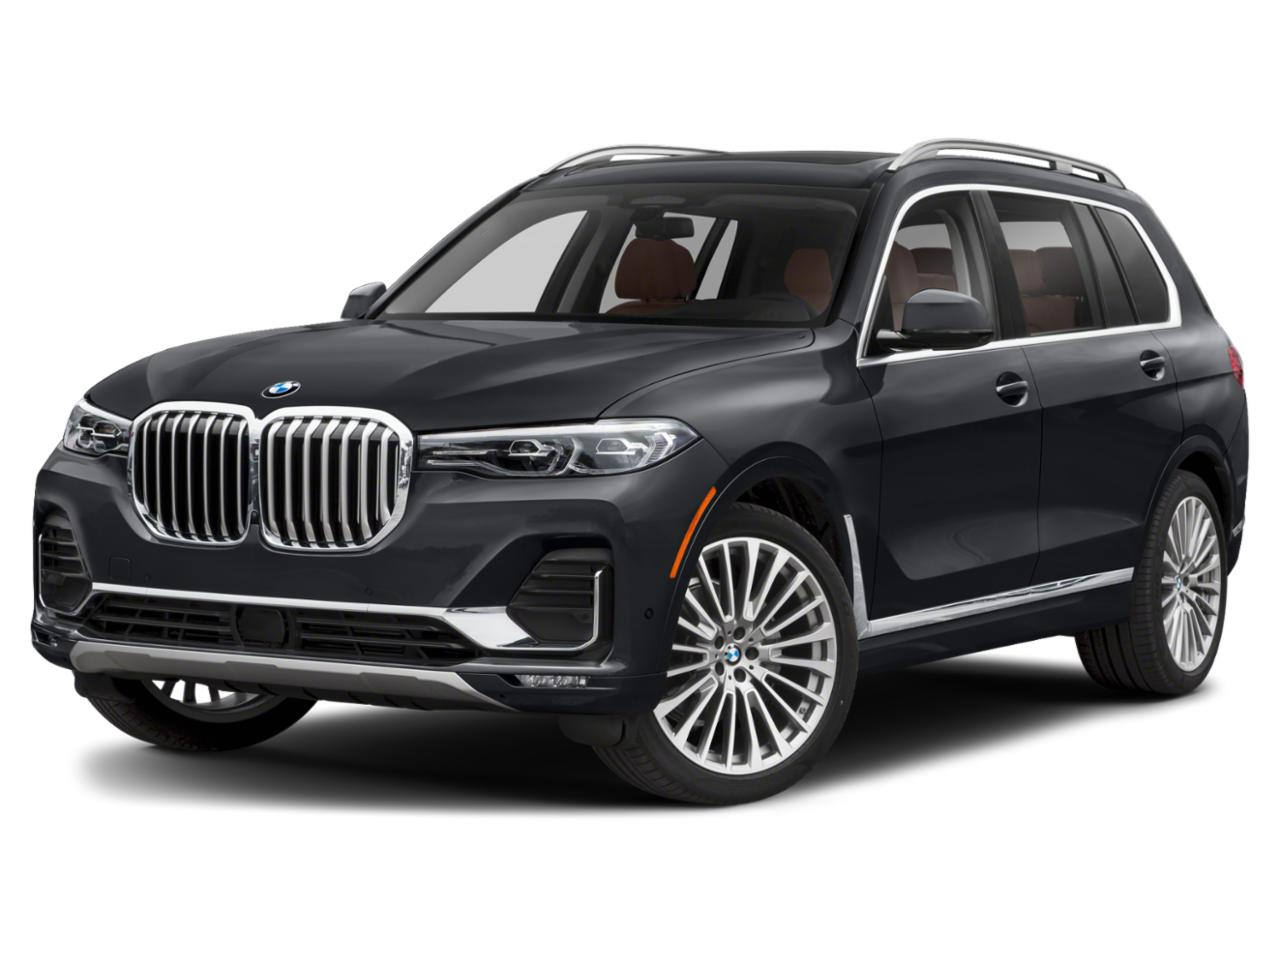 2022 BMW X7 M50i Vehicle Photo in PLANO, TX 75024-3599